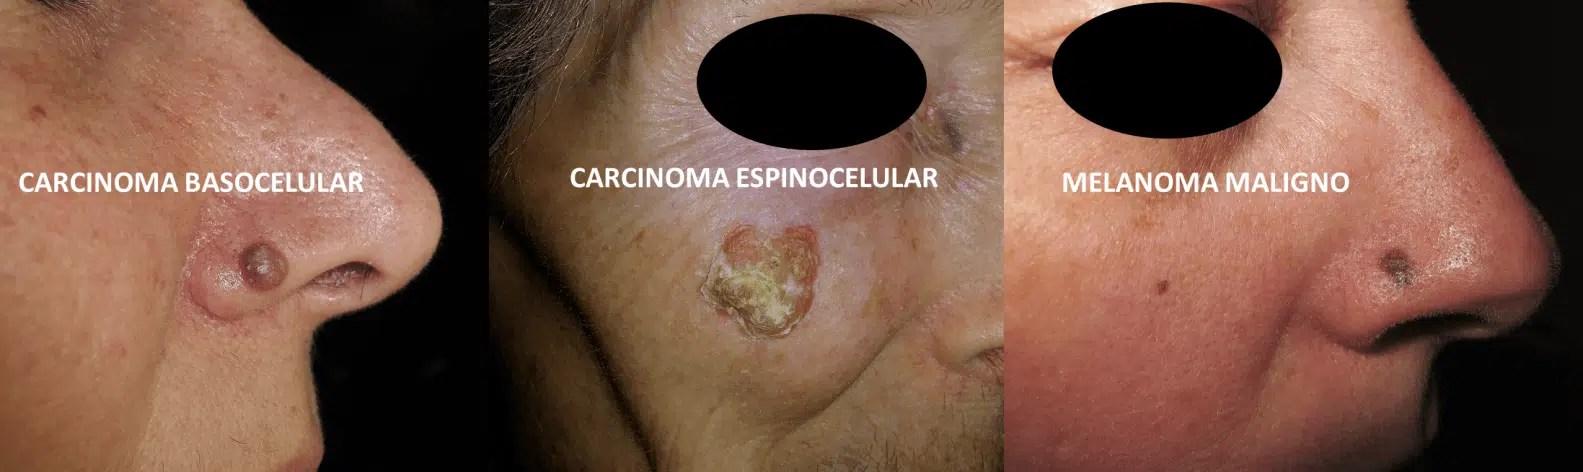 Cáncer de Piel – Dra. Paola Pasquali Dermatólogo | Barcelona ...